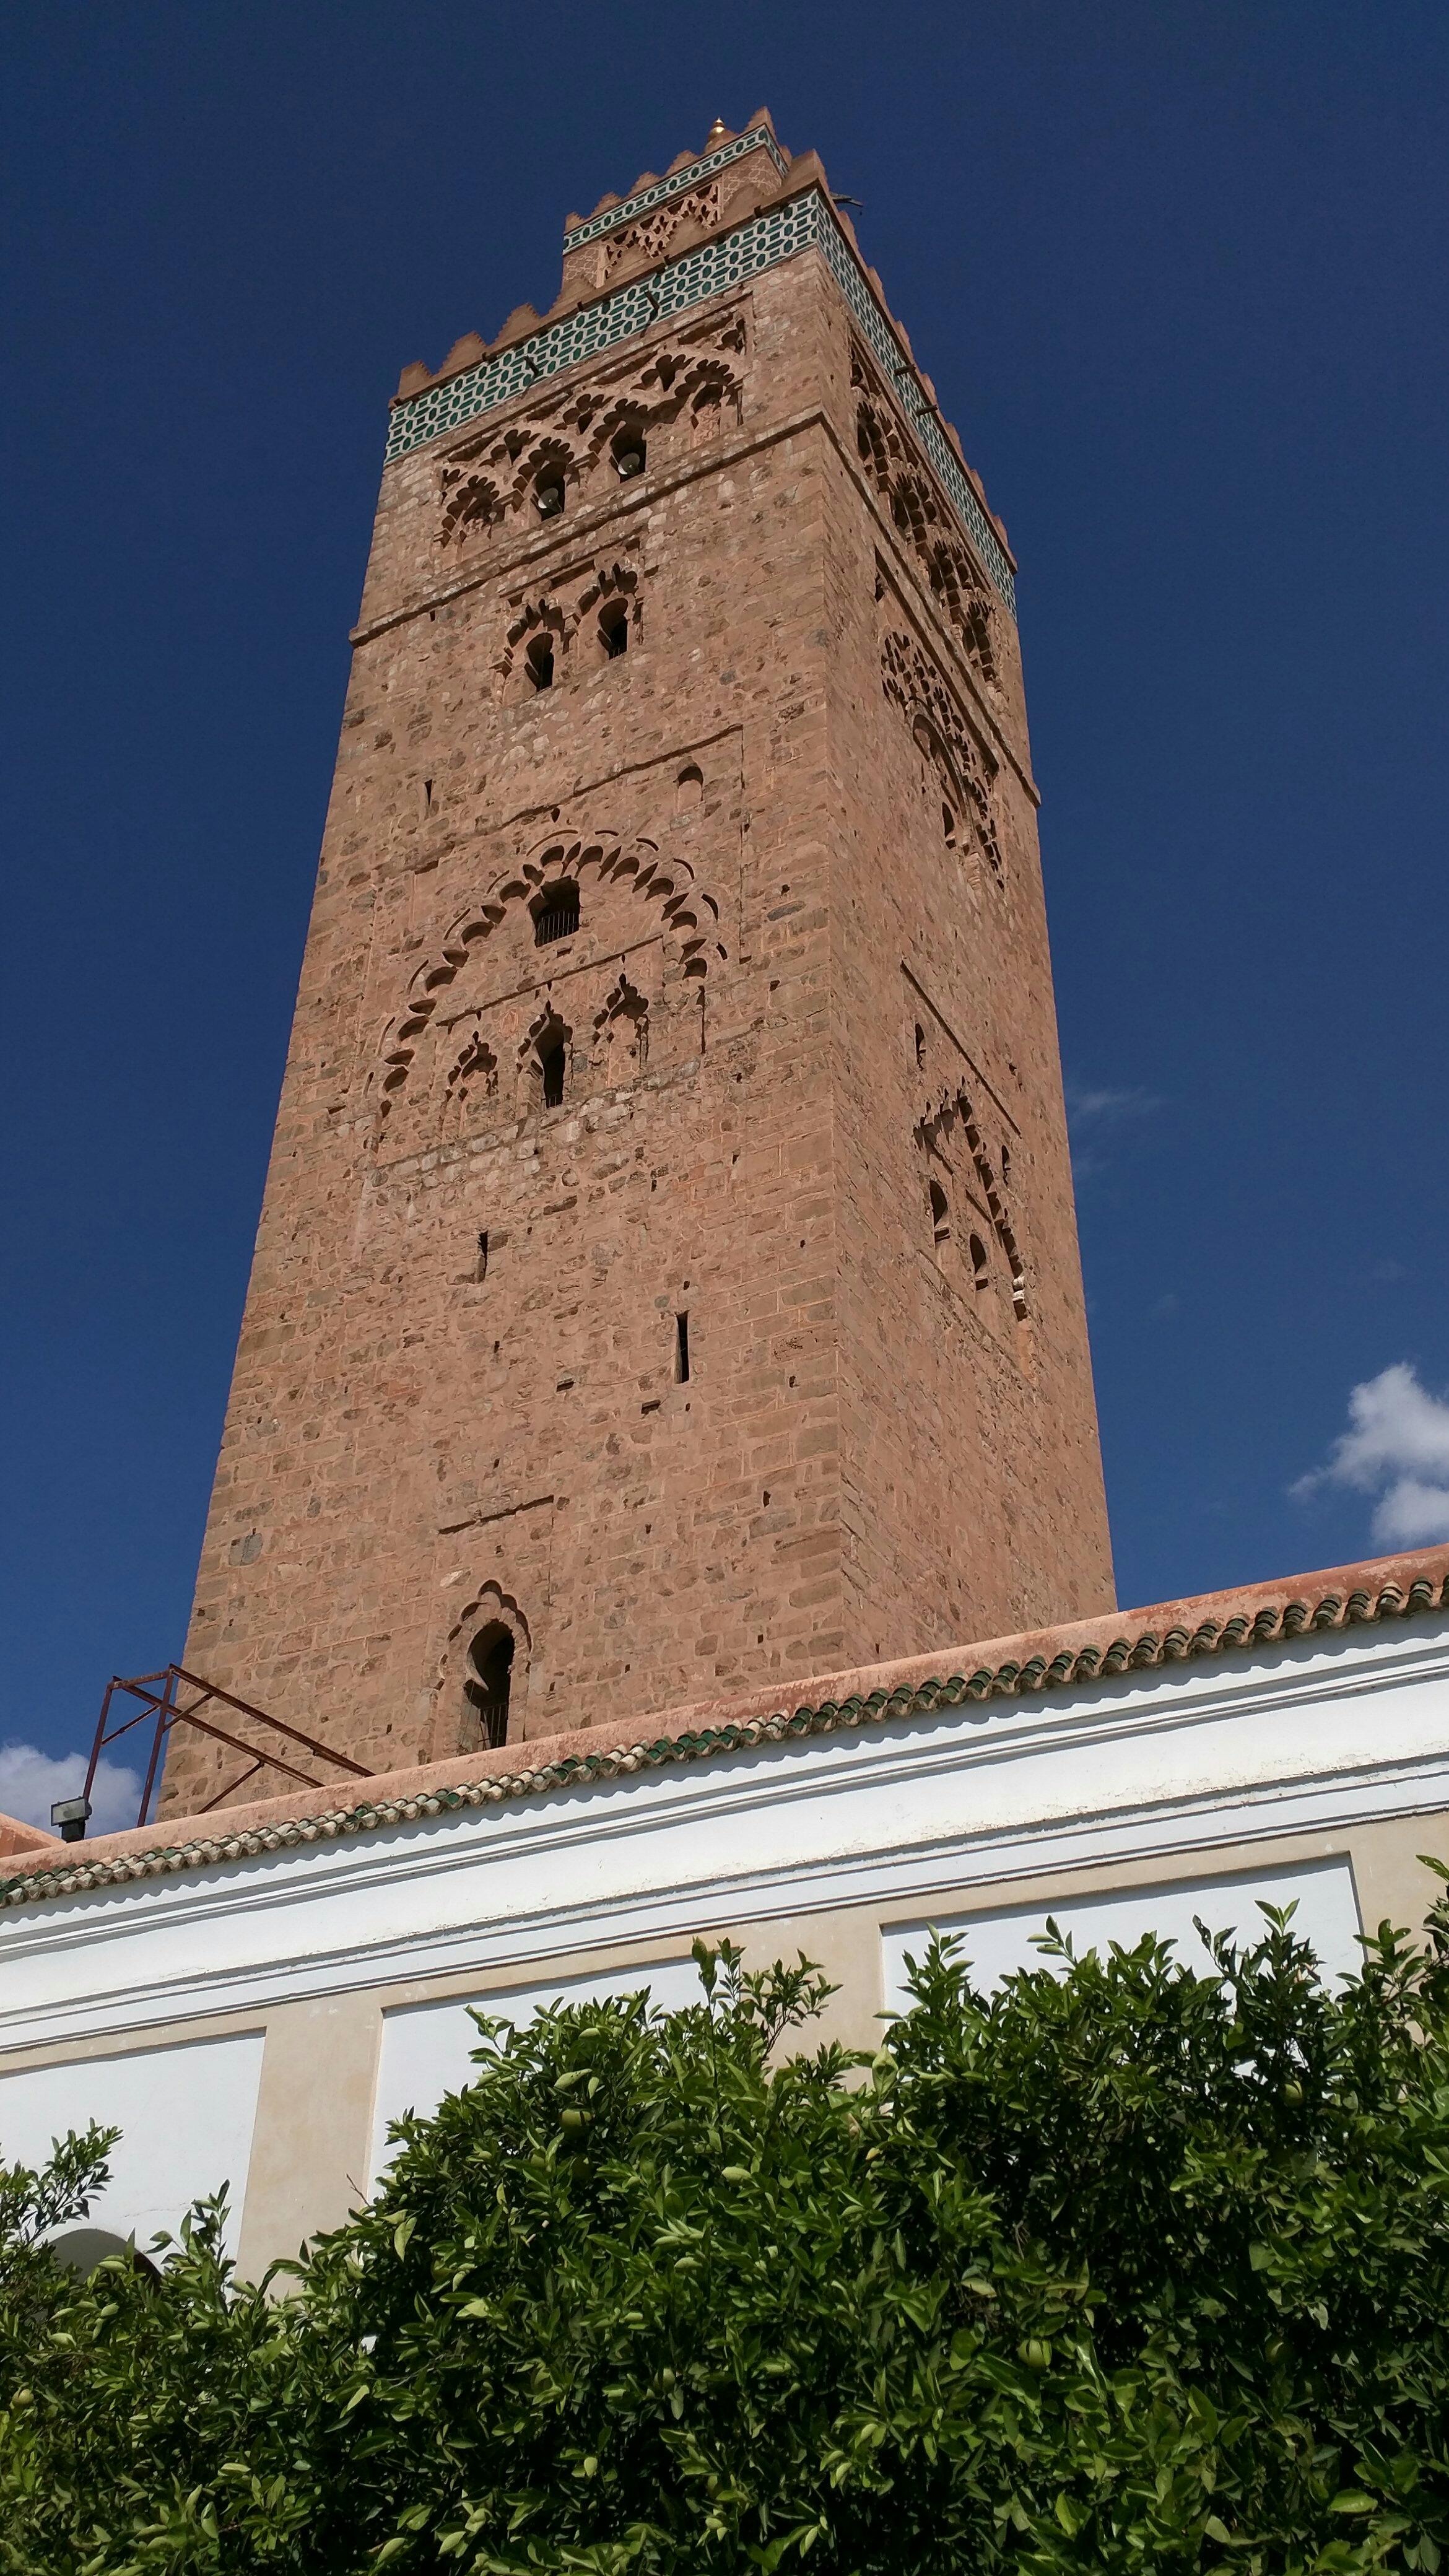 Minaret of Koutoubia Masjid